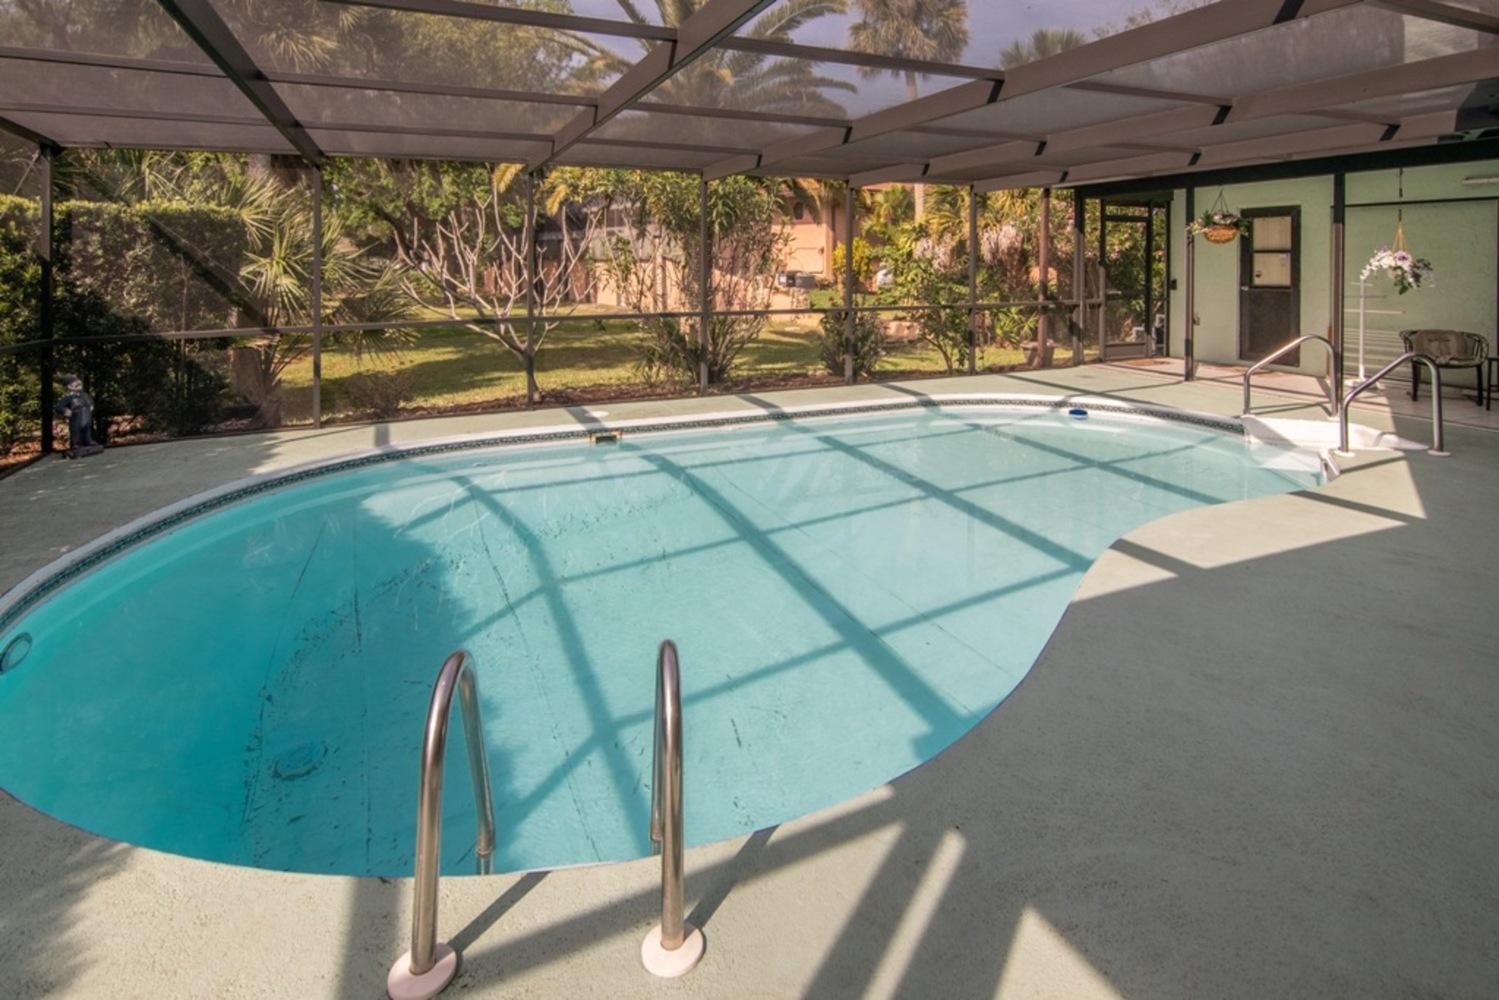 49 pool